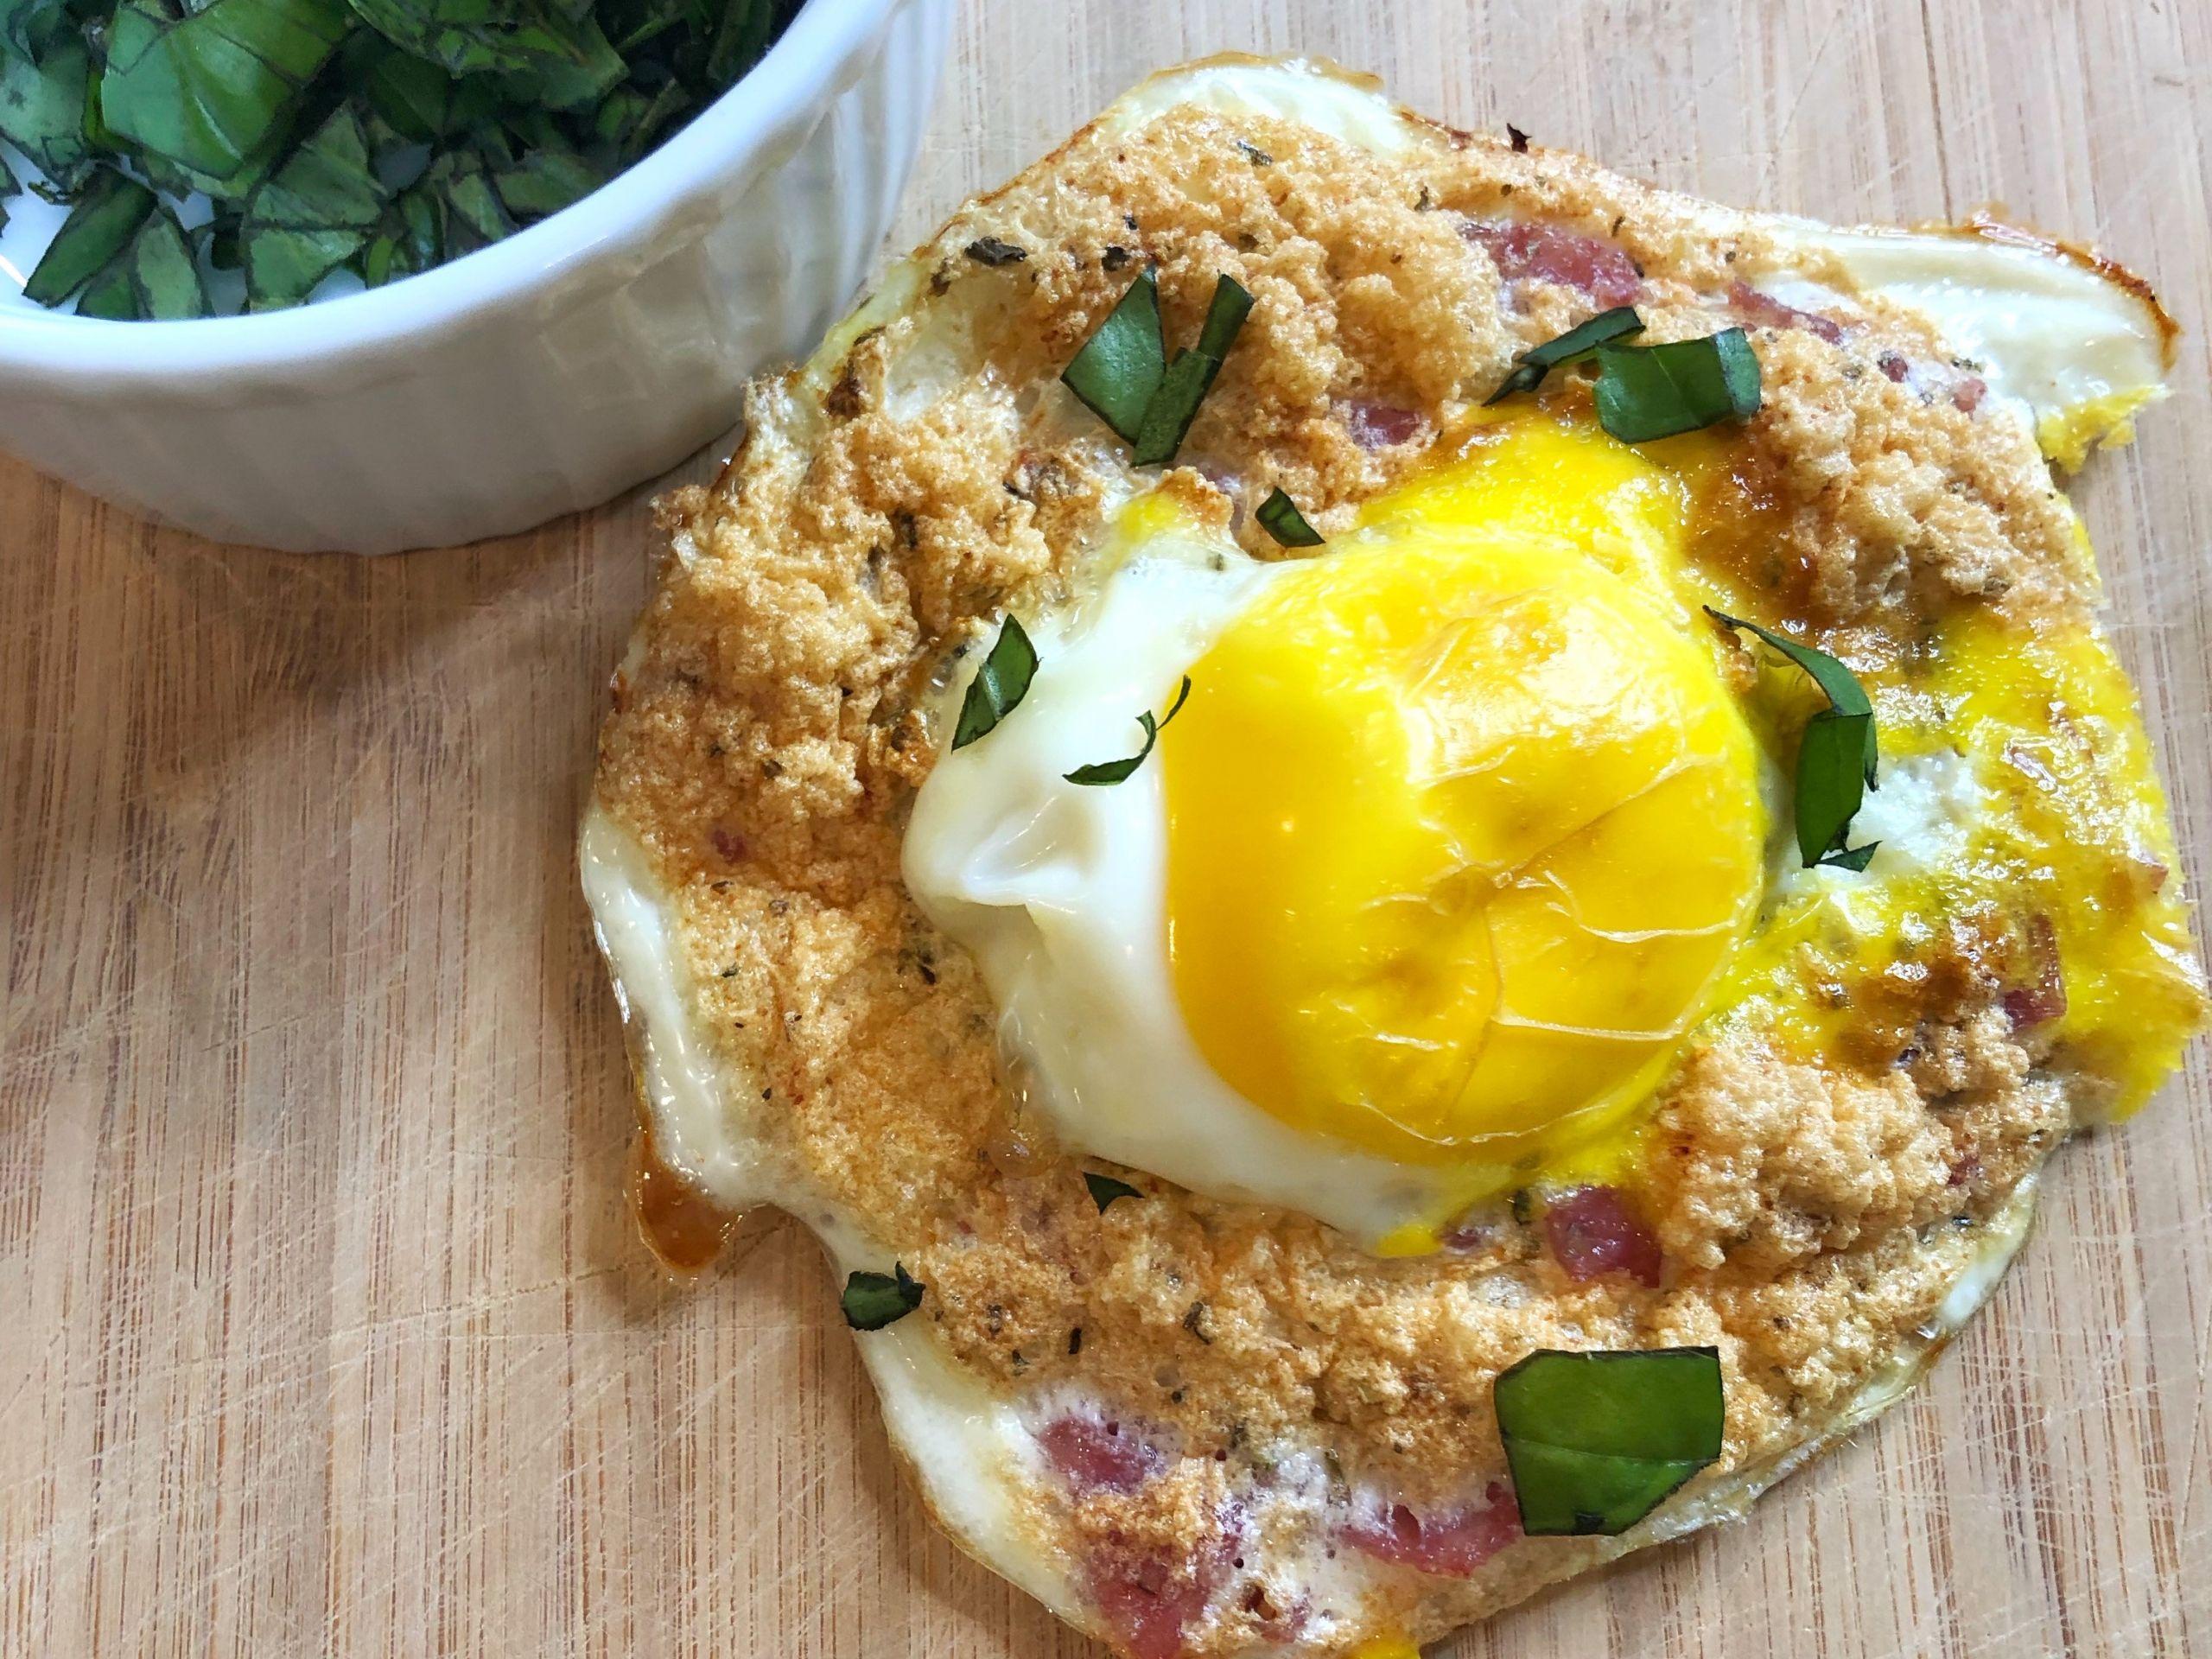 Diabetic Brunch Recipes  Egg Clouds Recipe for Diabetes Diabetic Make Ahead